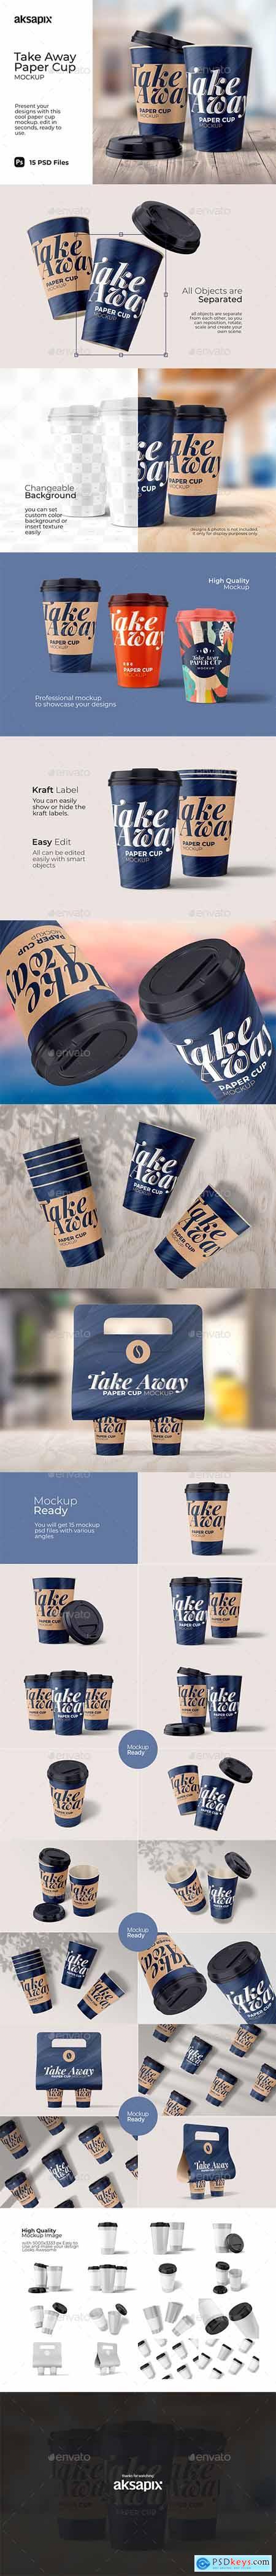 Take Away Paper Cup - Mockup 29600205